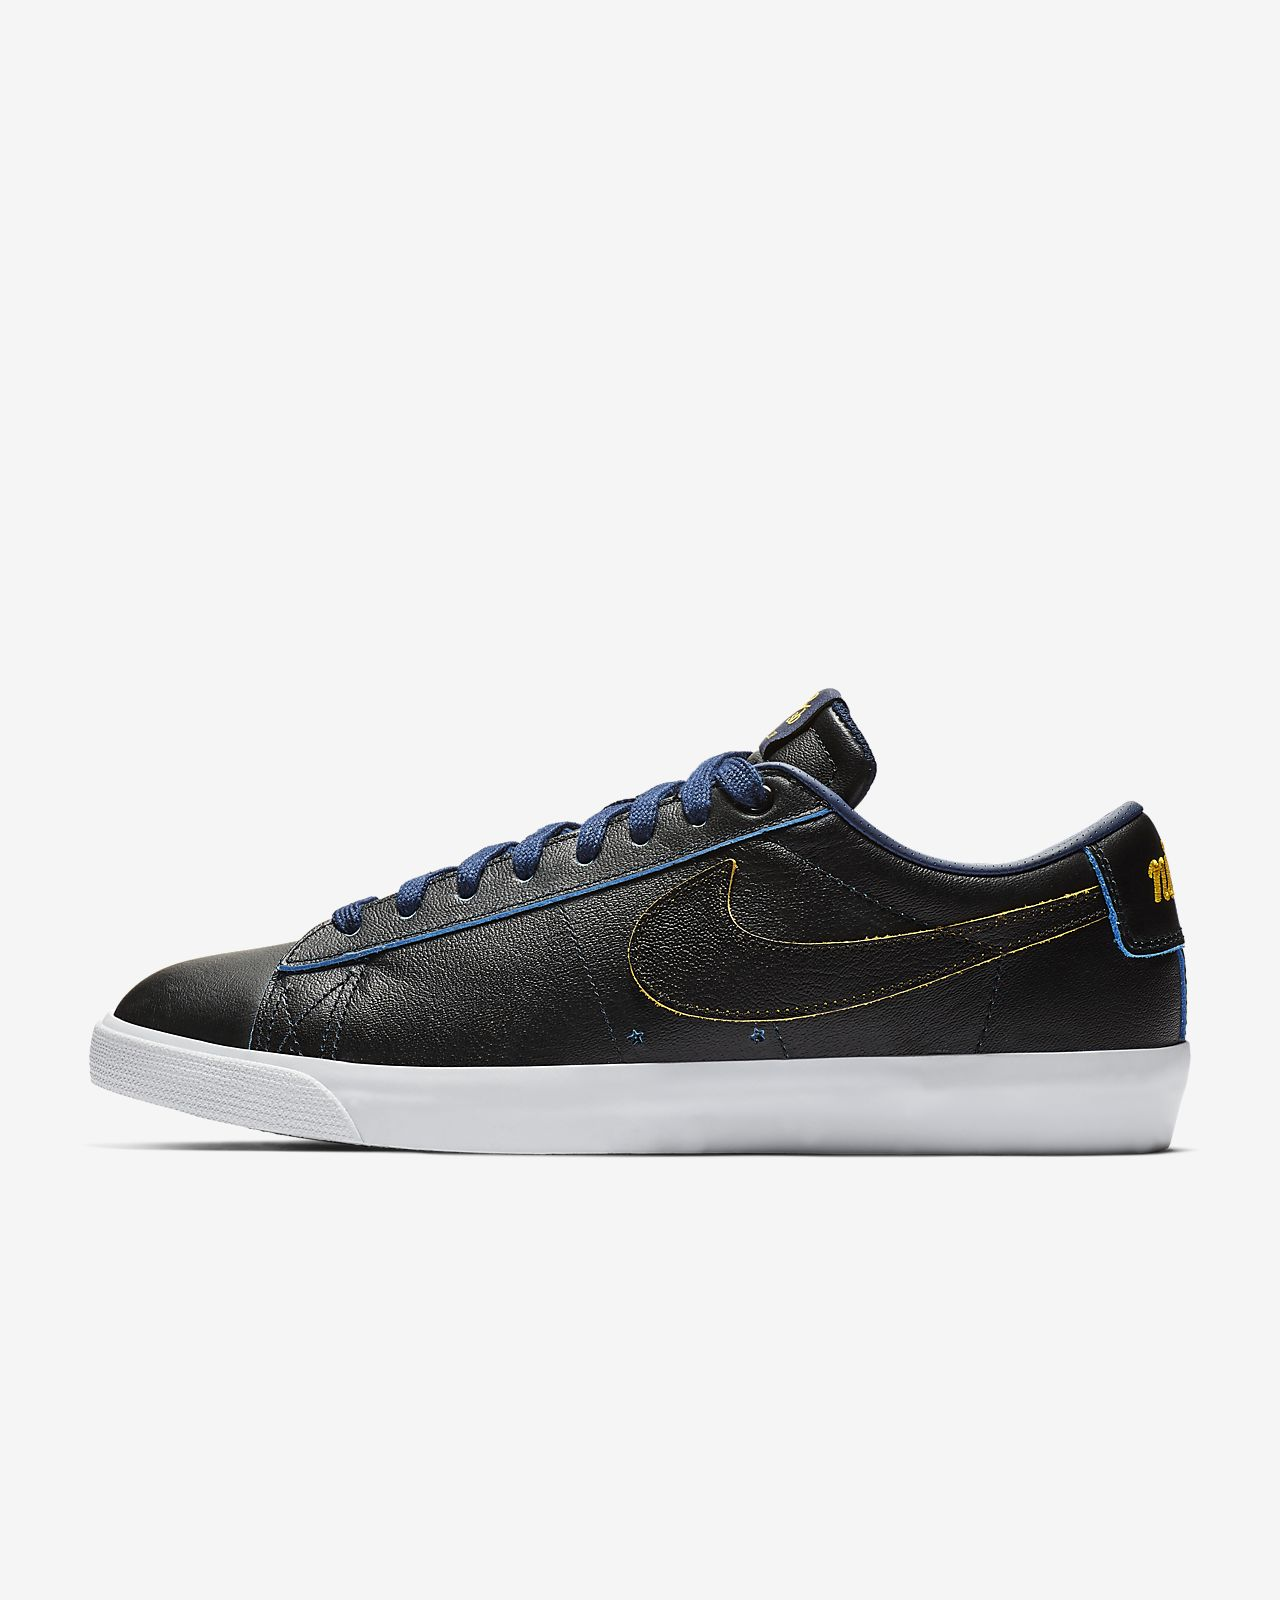 Calzado de skateboarding para hombre Nike SB Blazer Low GT NBA